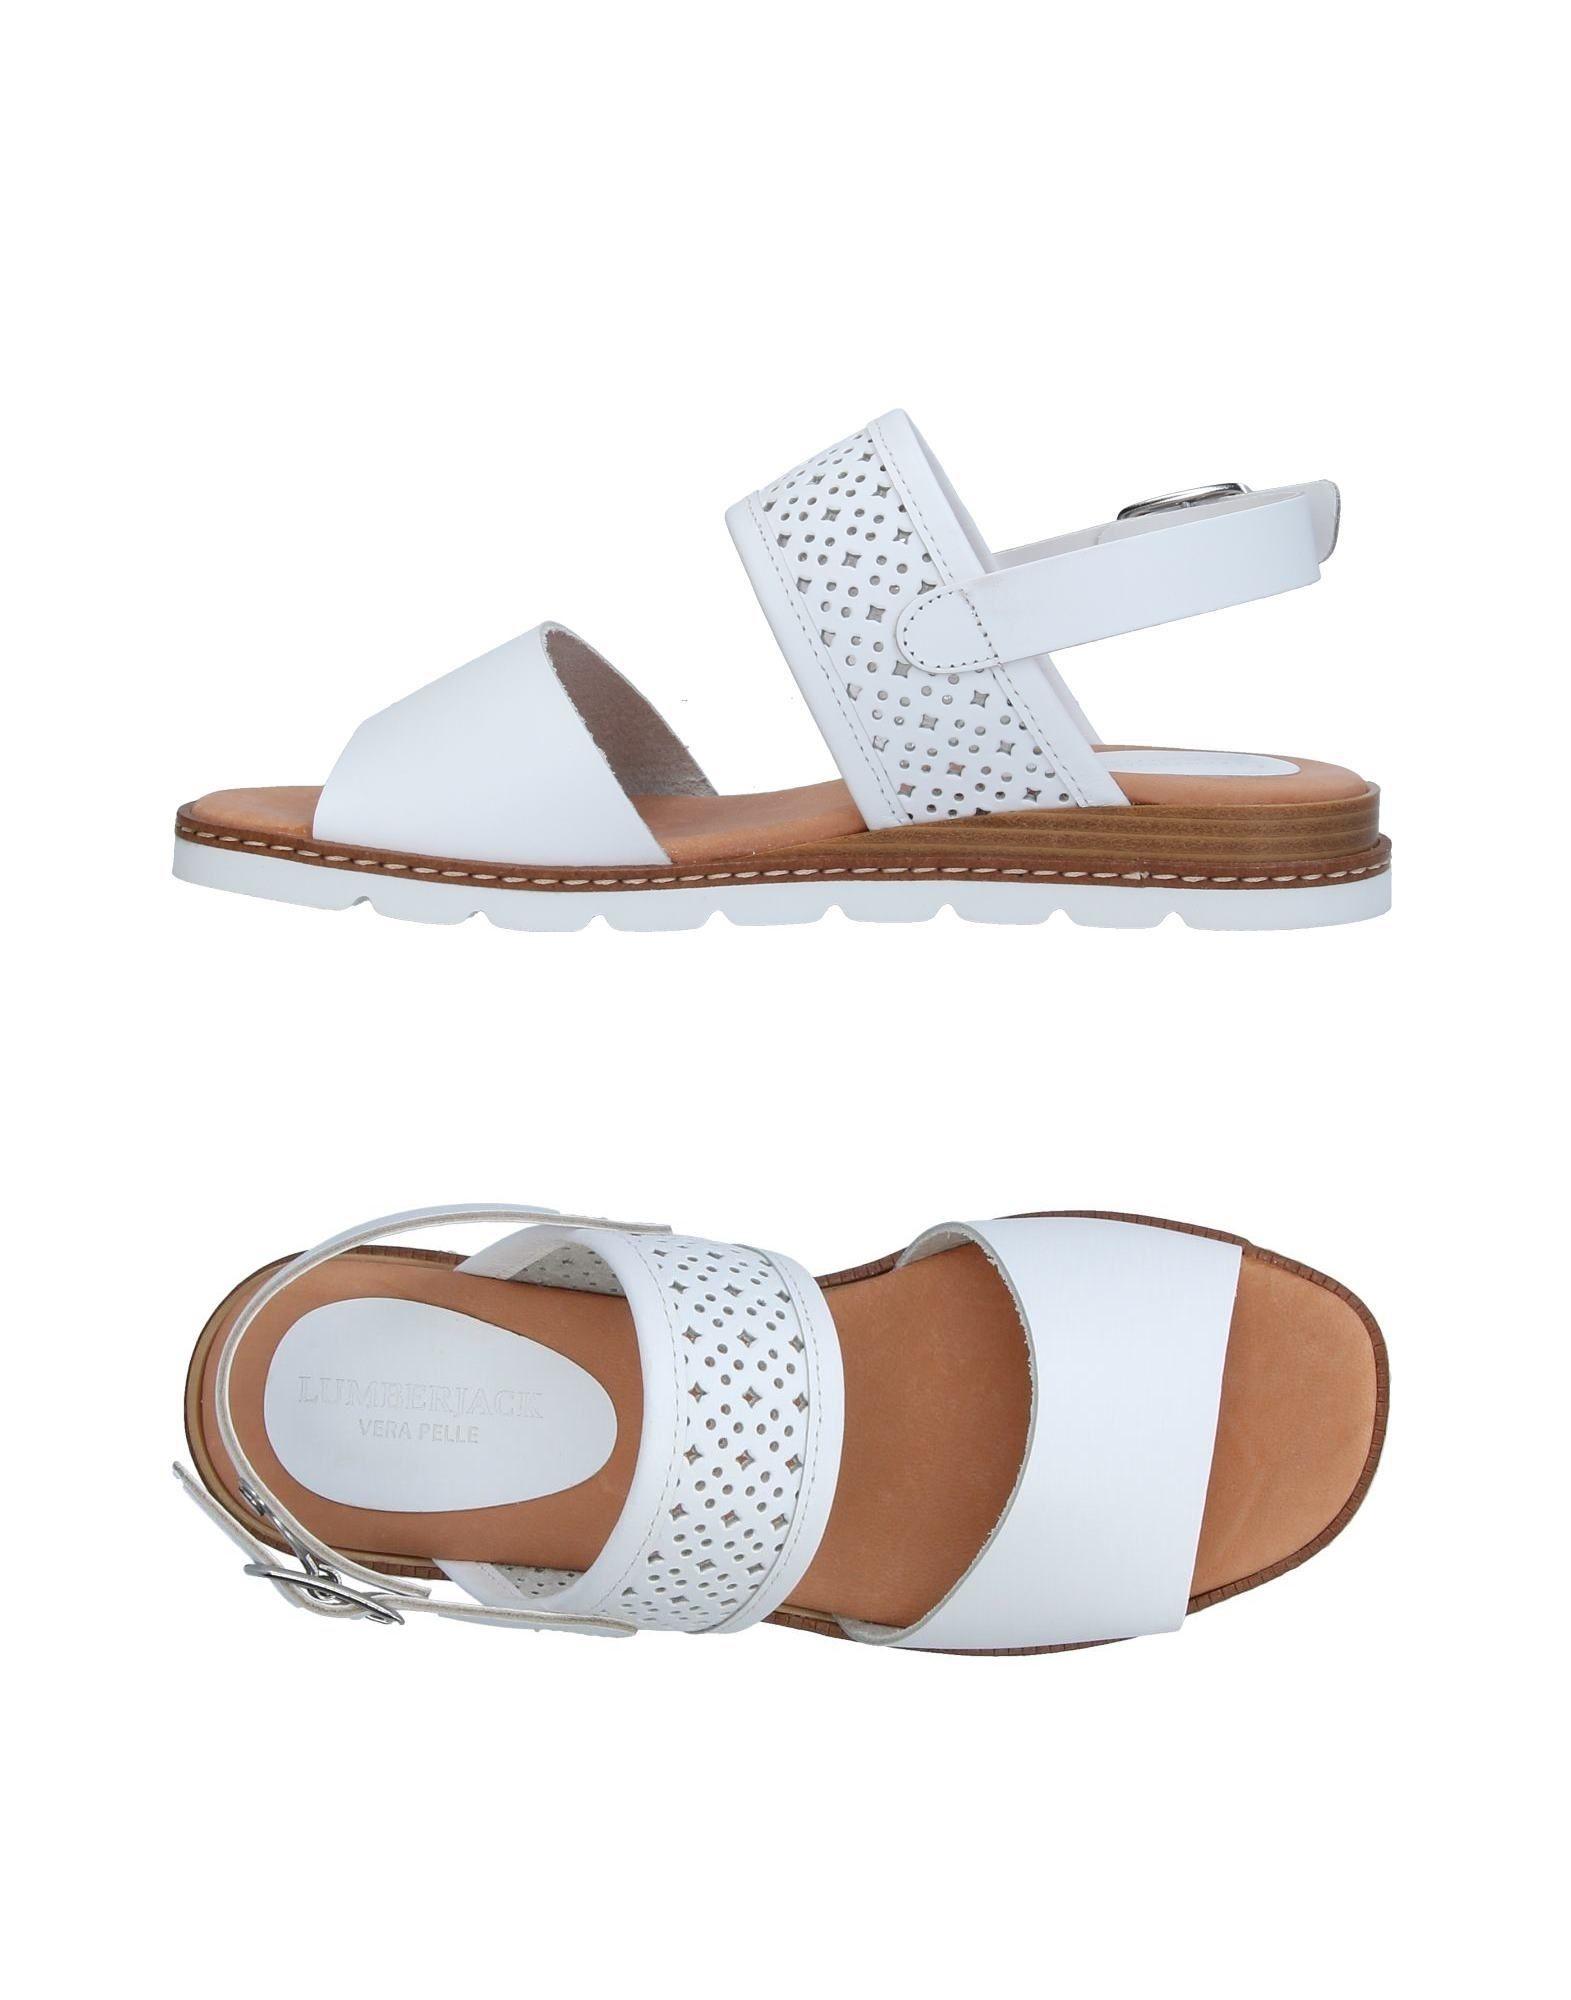 891336436c01d7 Lumberjack Sandals - Women Lumberjack Sandals online on YOOX United ...